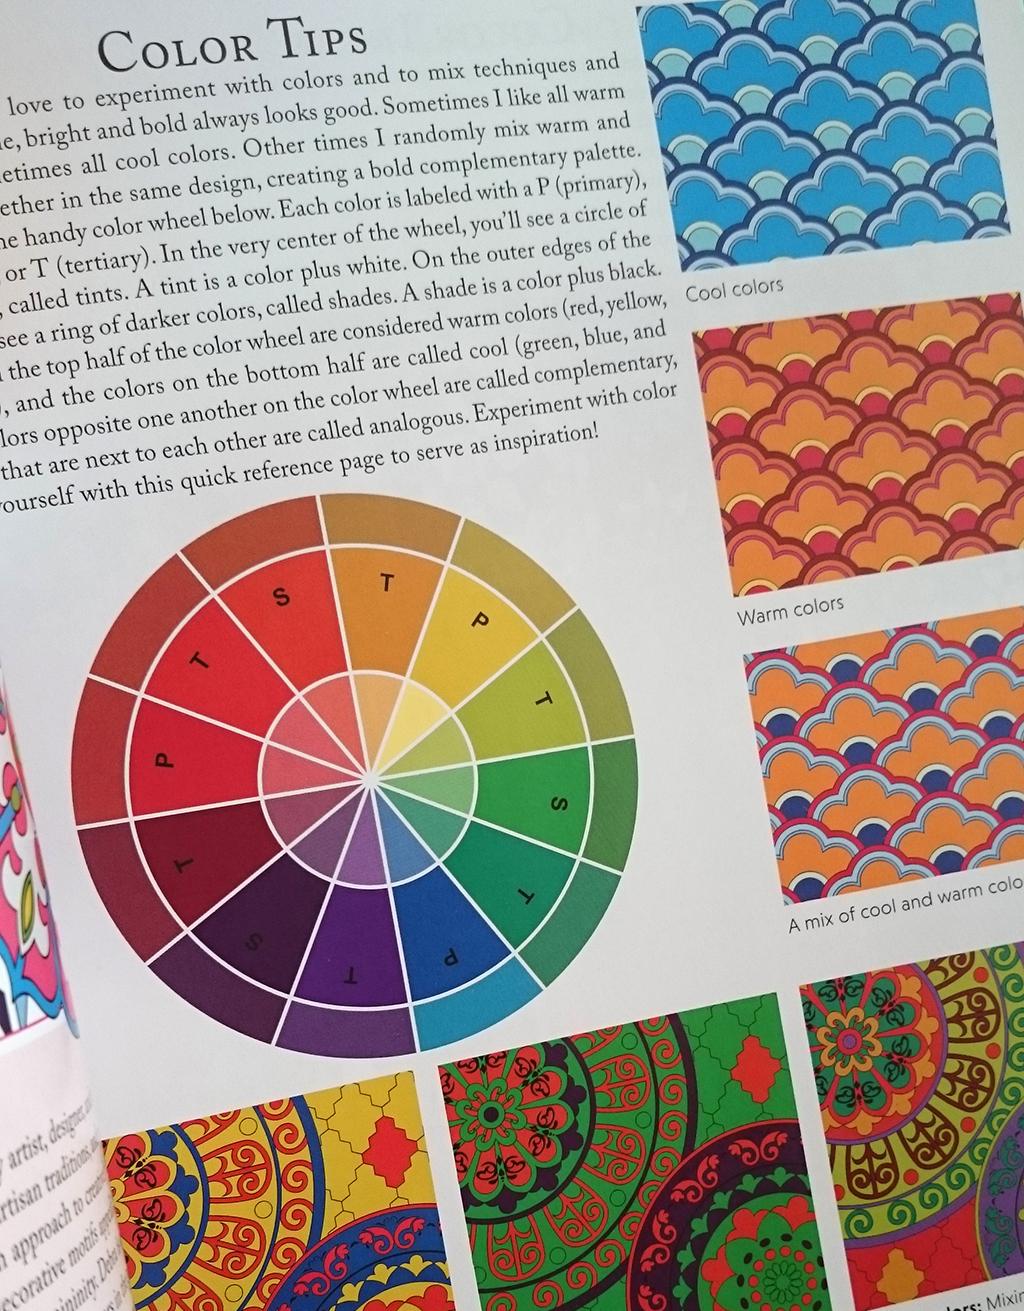 World-Beat-Designs-Mandalas-and-More-Coloring-Book-02